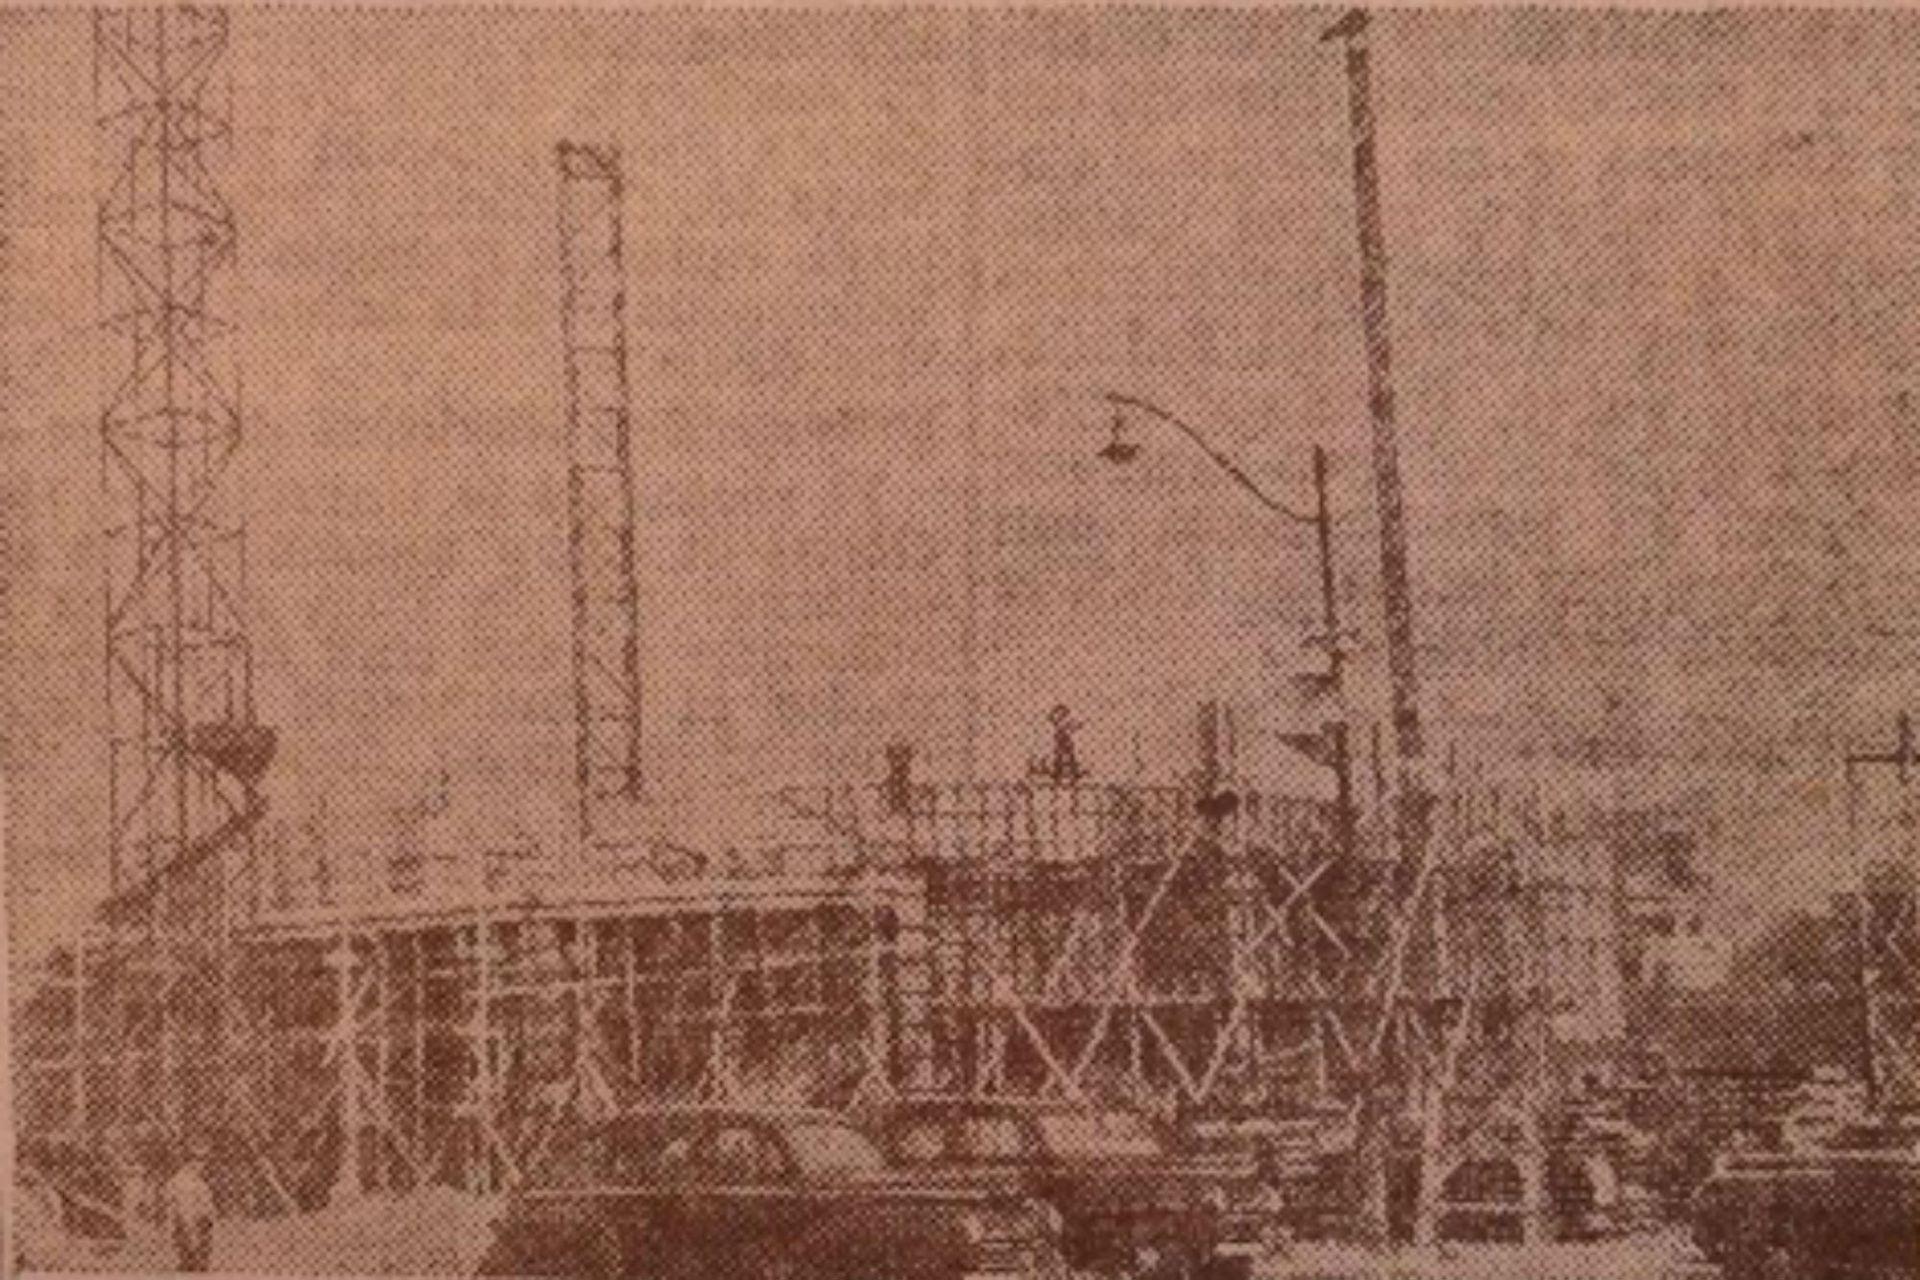 La platea de la obra estaba preparada para resistir las 42.000 toneladas del monumento